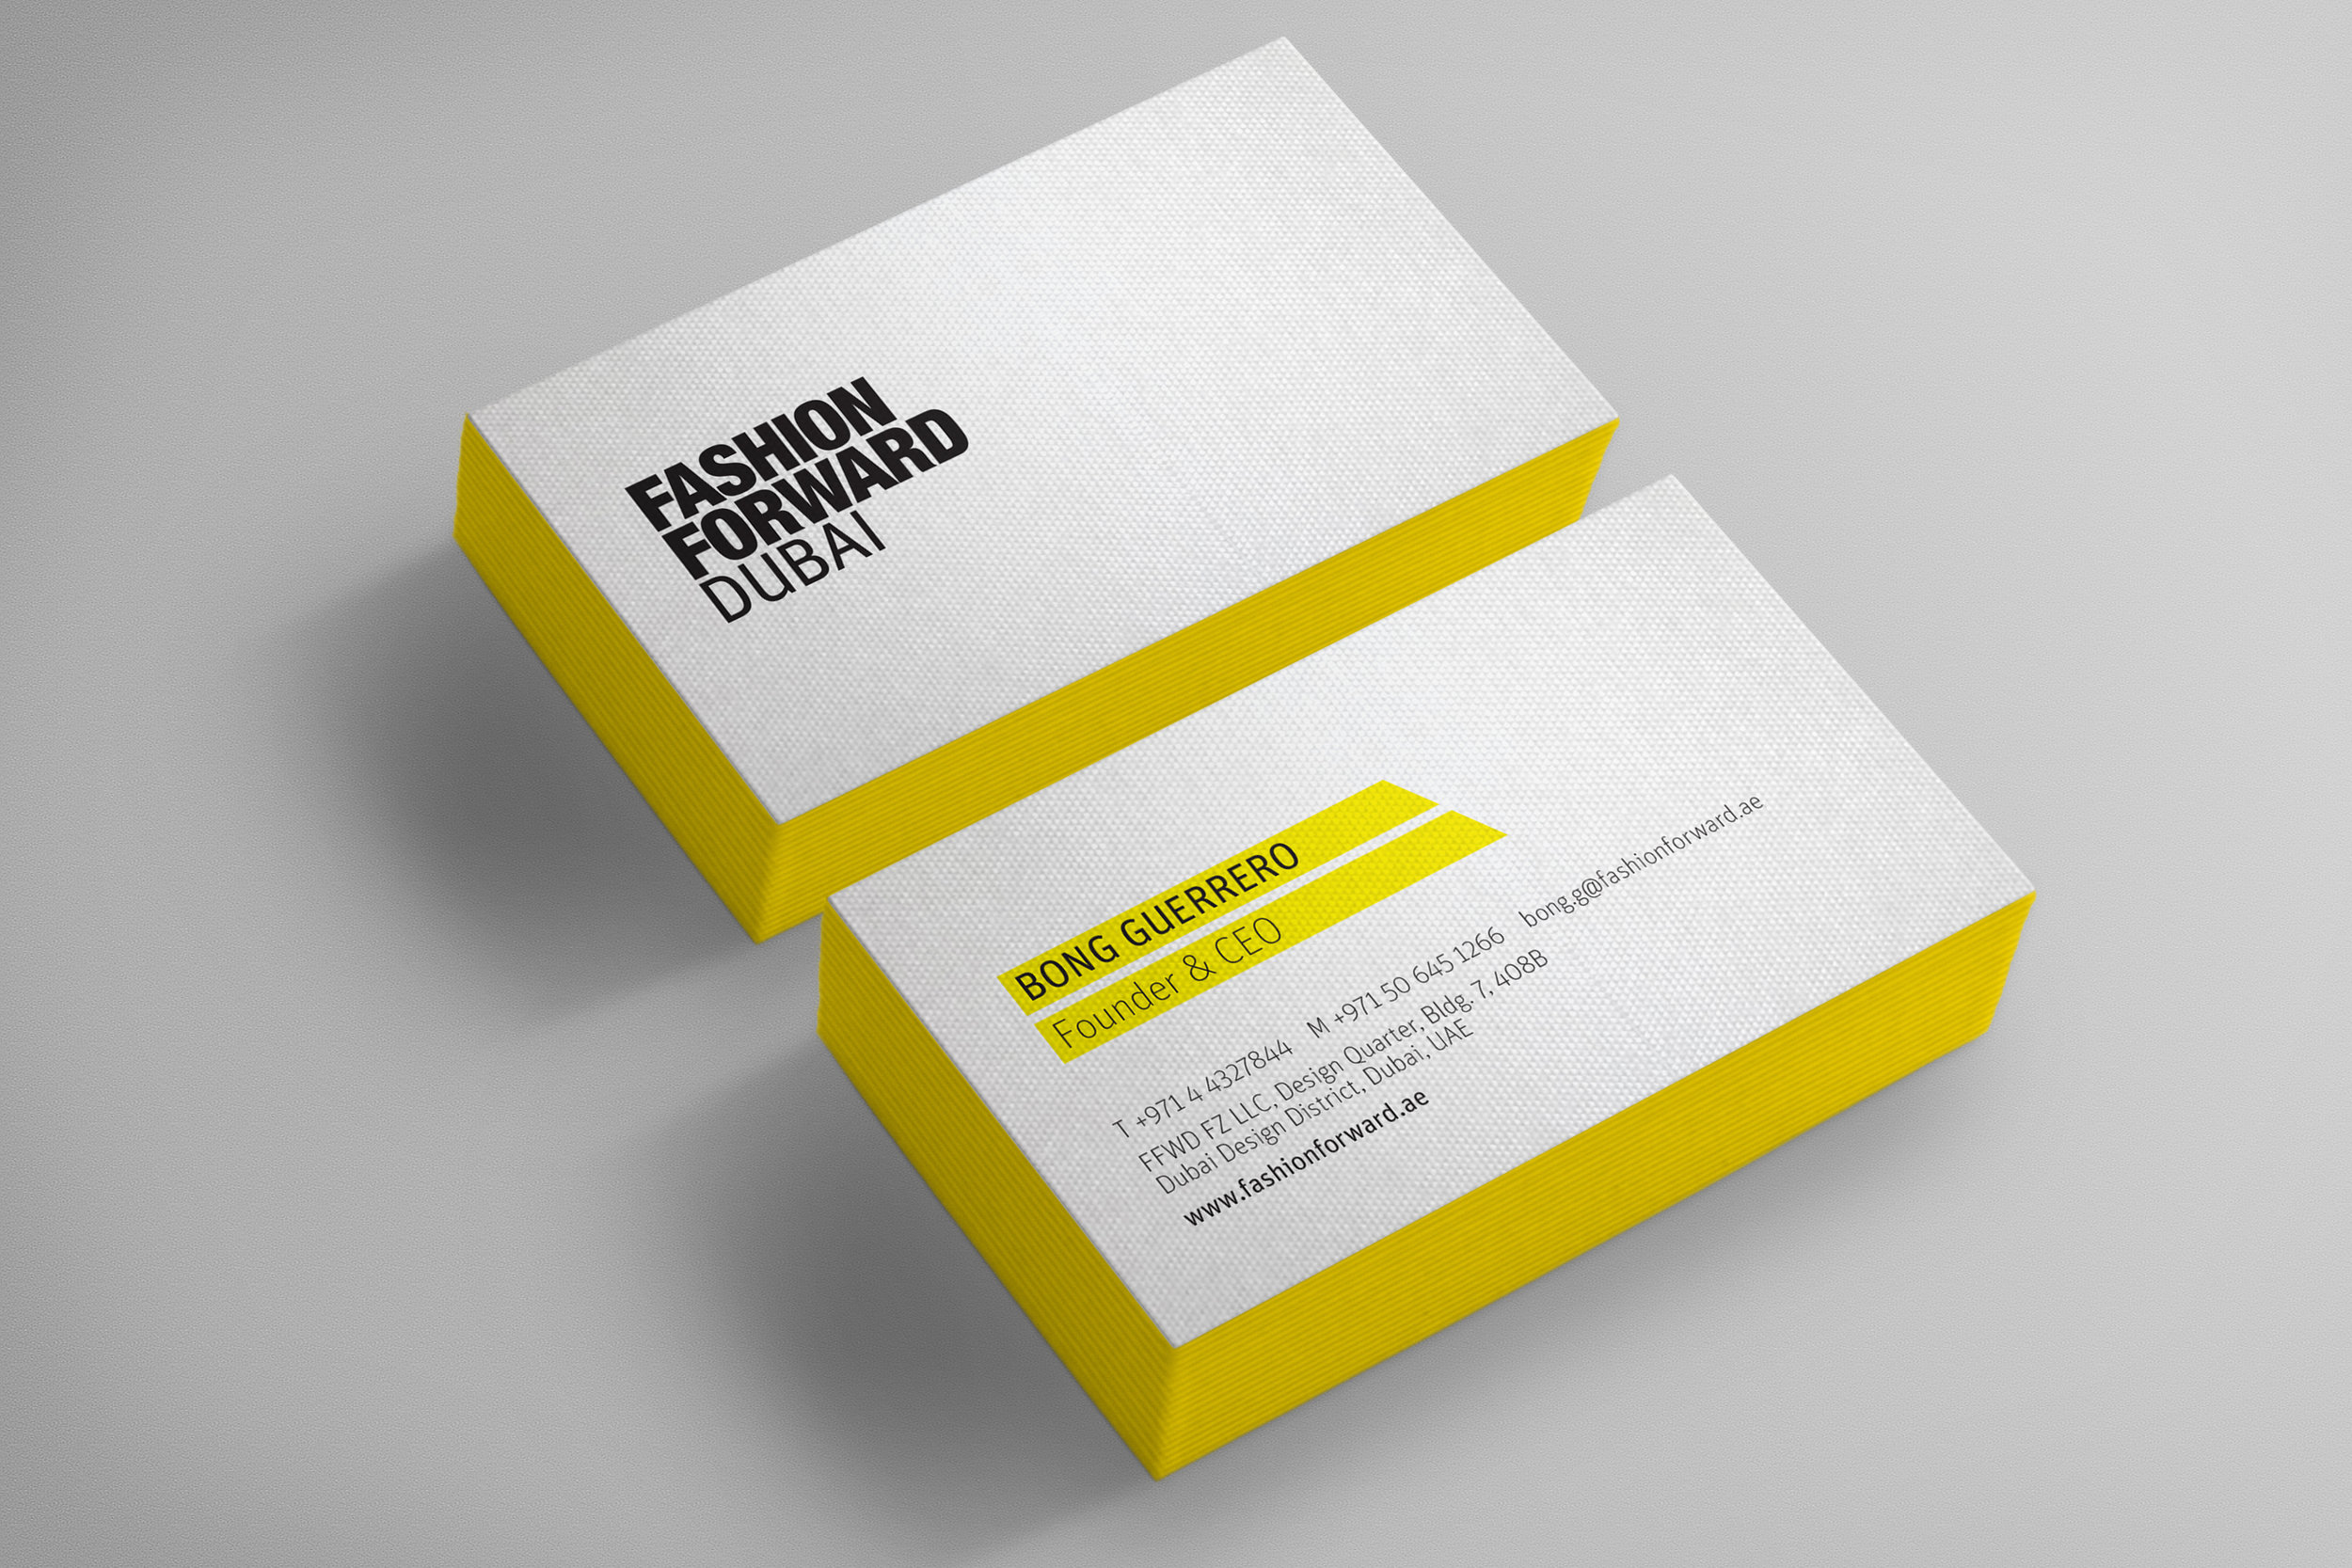 FFWD_Branding_BusinessCards.jpg